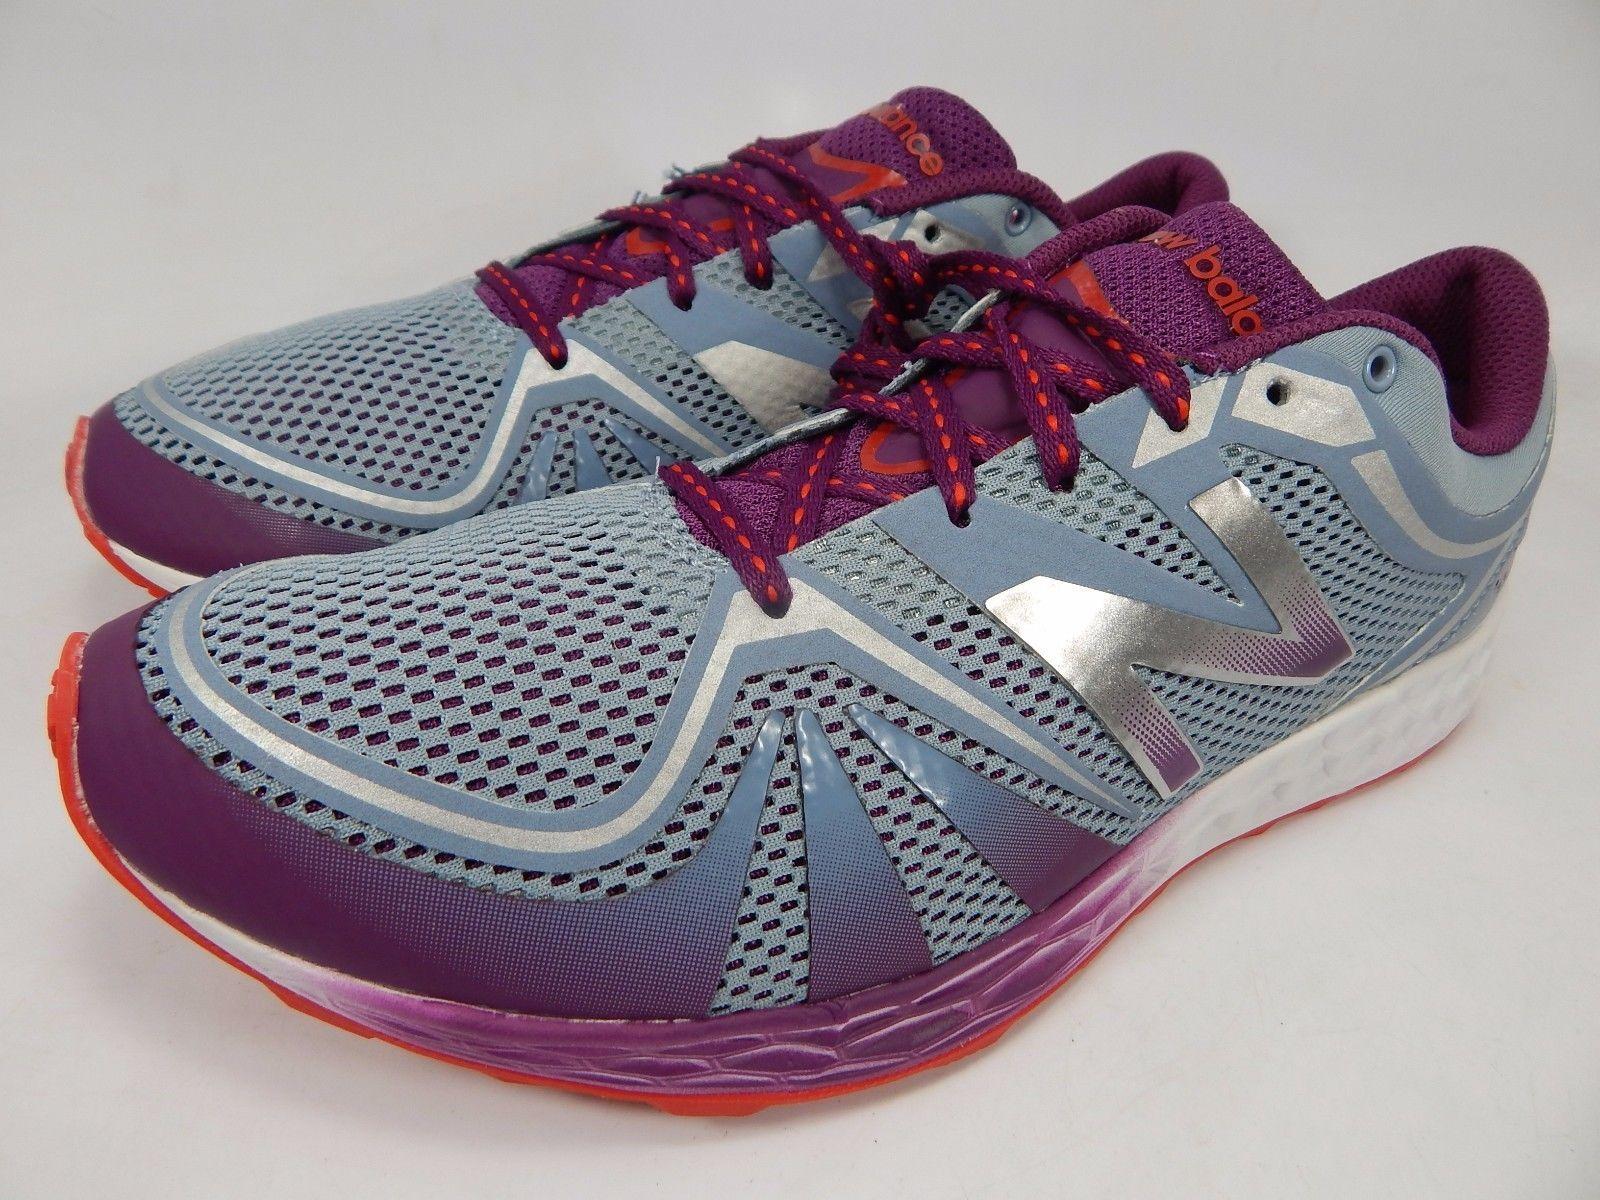 New Balance 822 Fresh Foam Women's Cross Trainer Shoes Size US 10 M (B) EU 41.5